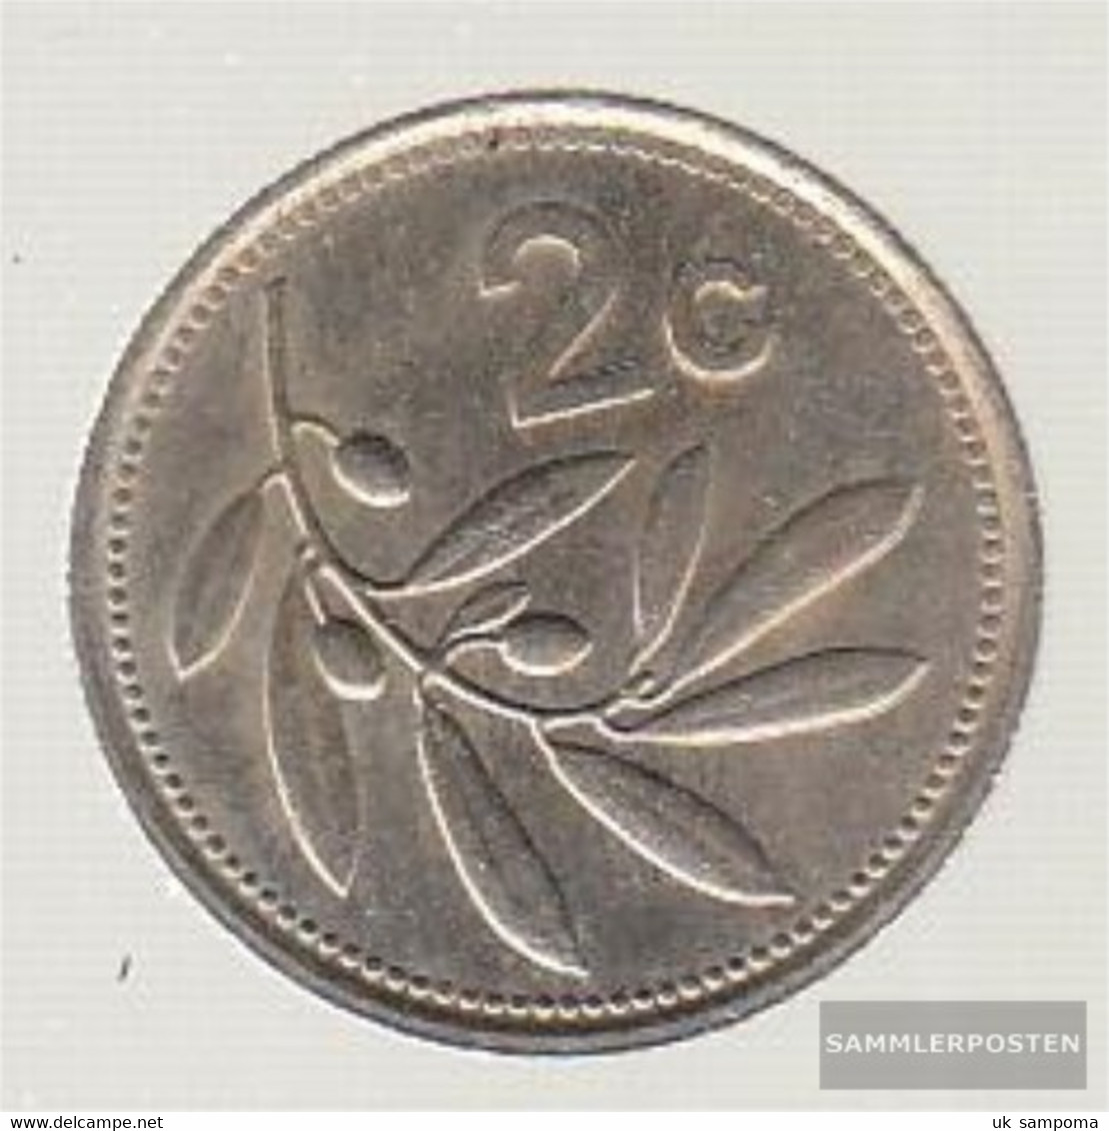 Malta Km-number. : 79 1986 Very Fine Copper-Nickel Very Fine 1986 2 Cent Emblem - Malta